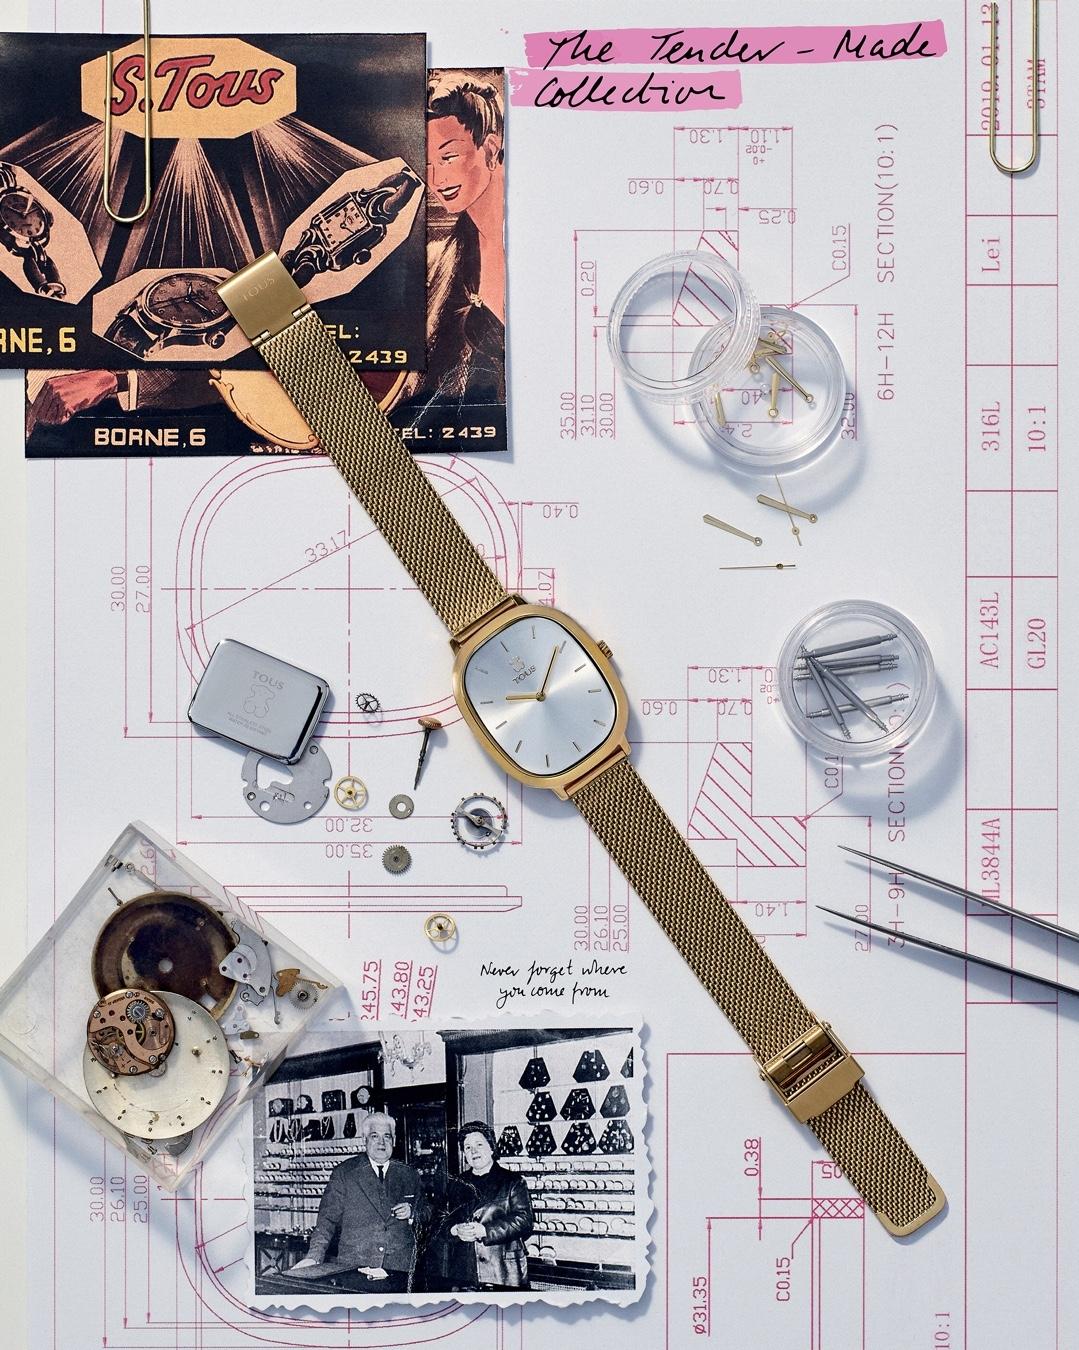 watch design Tous watch on a technical plan